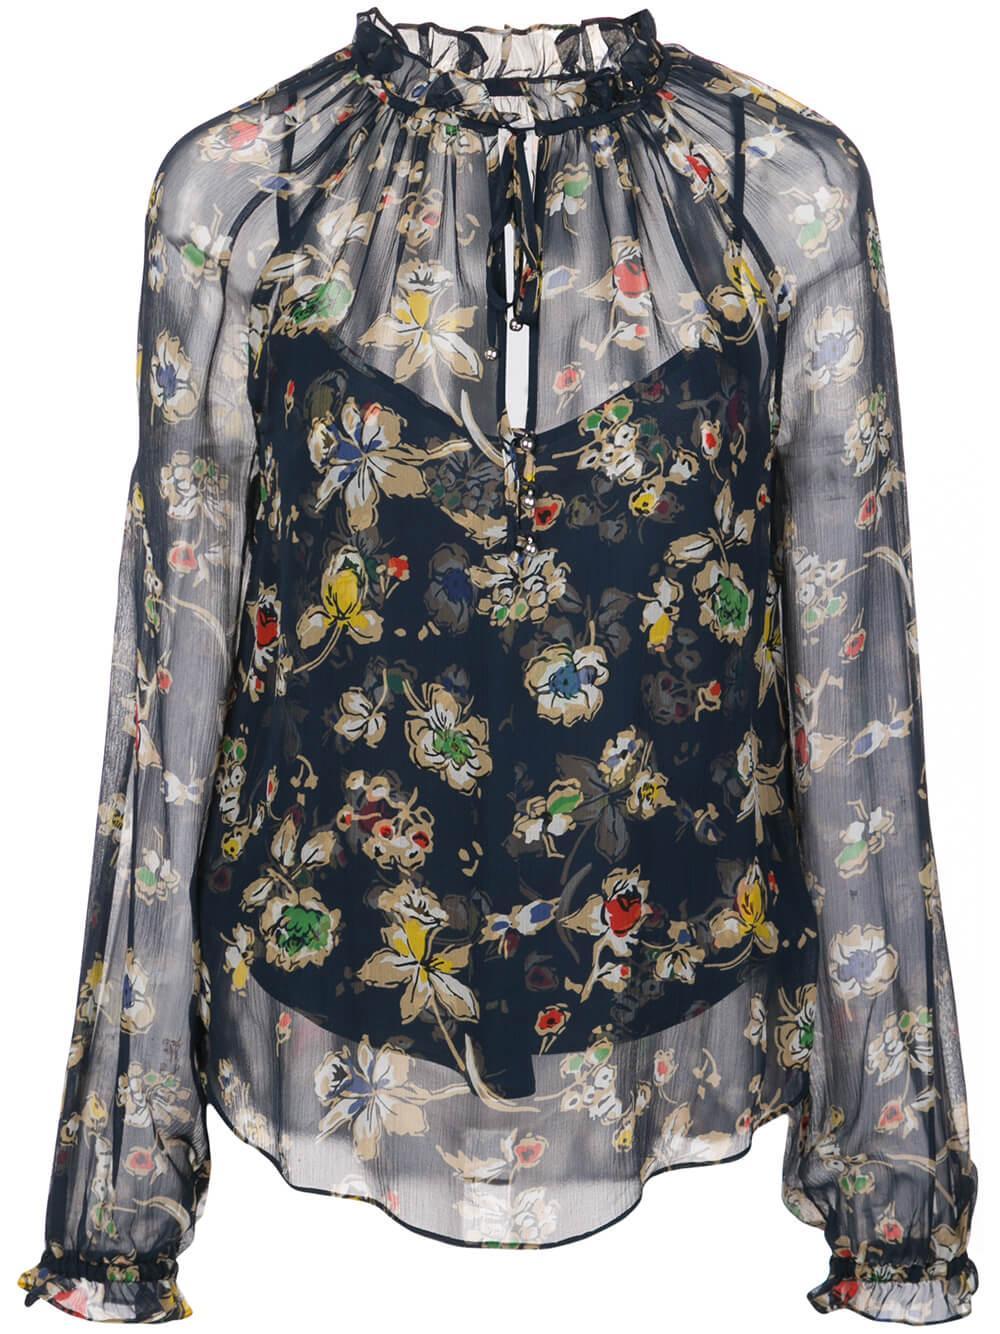 Antonette Long Sleeve Floral Print Blouse Item # 2001CHF074664